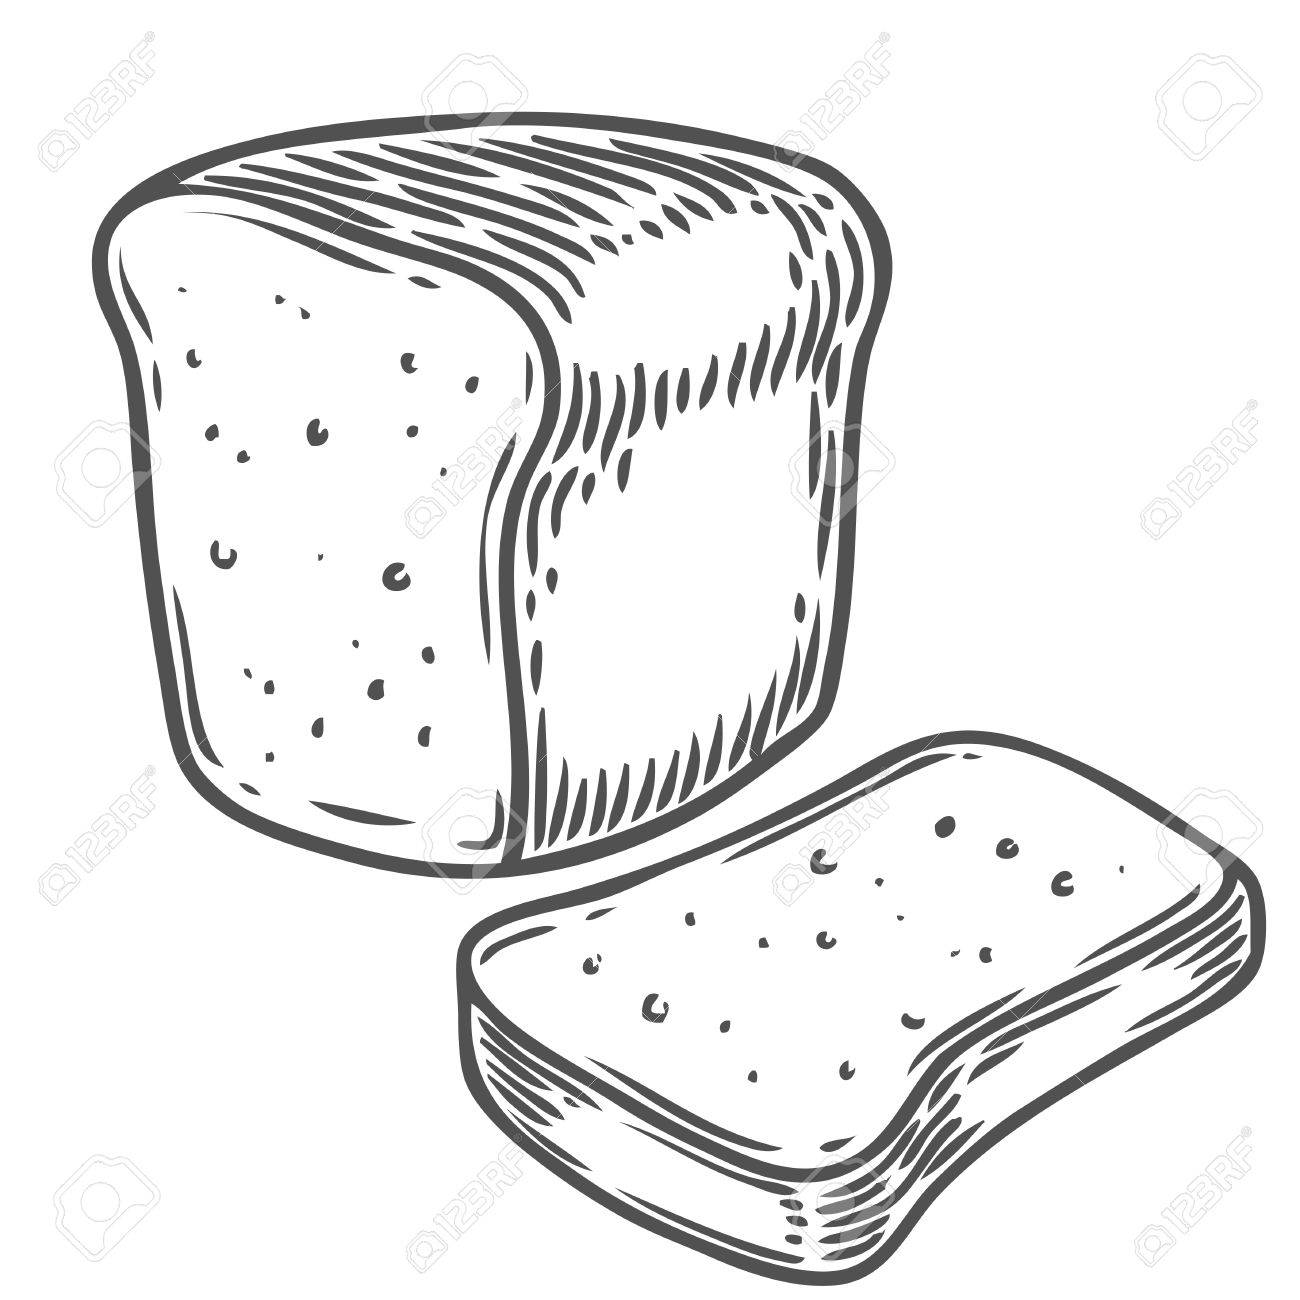 1300x1300 Wheat Bread Drawing